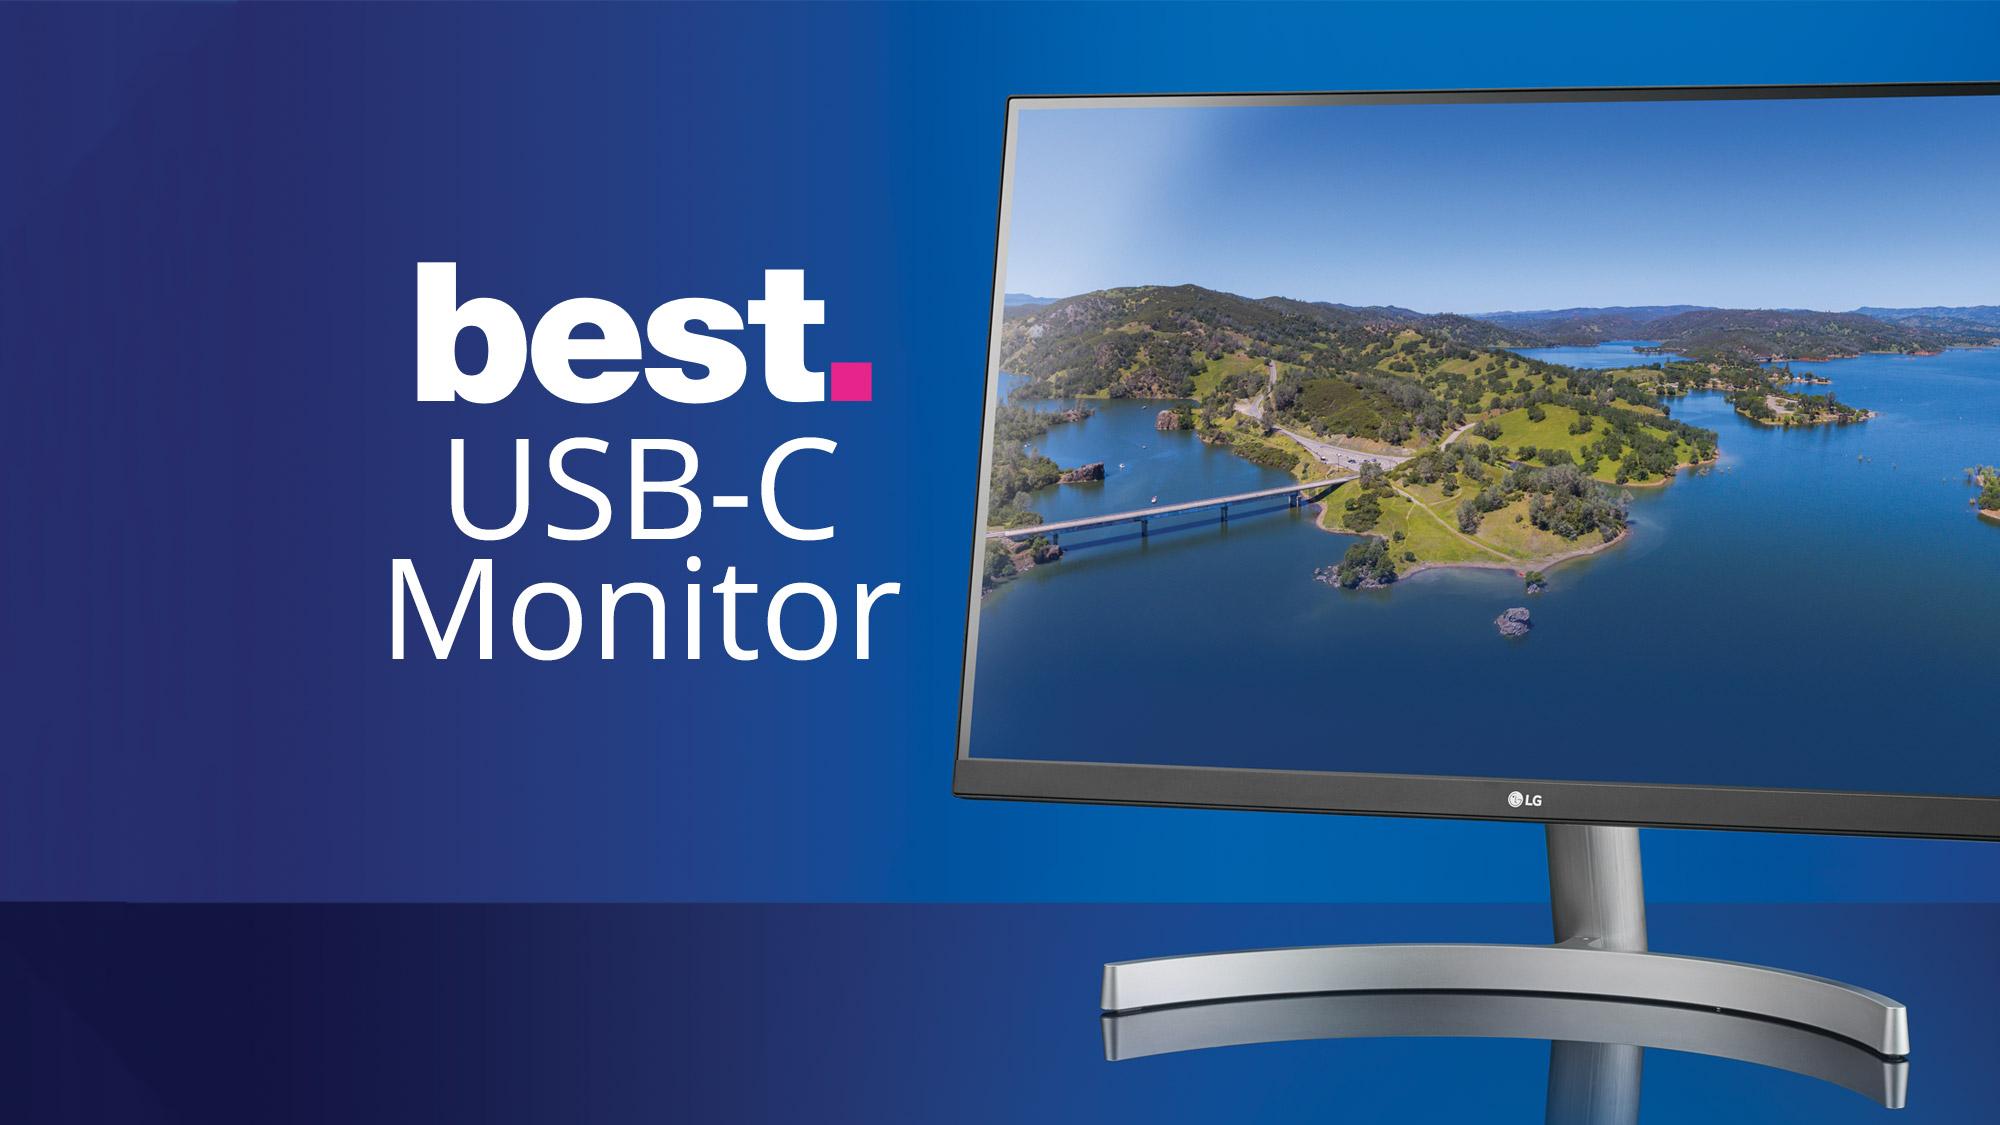 Pc Compatible Monitor For Mac redtasht ZvwLWey6fZMGpreka8XpNR